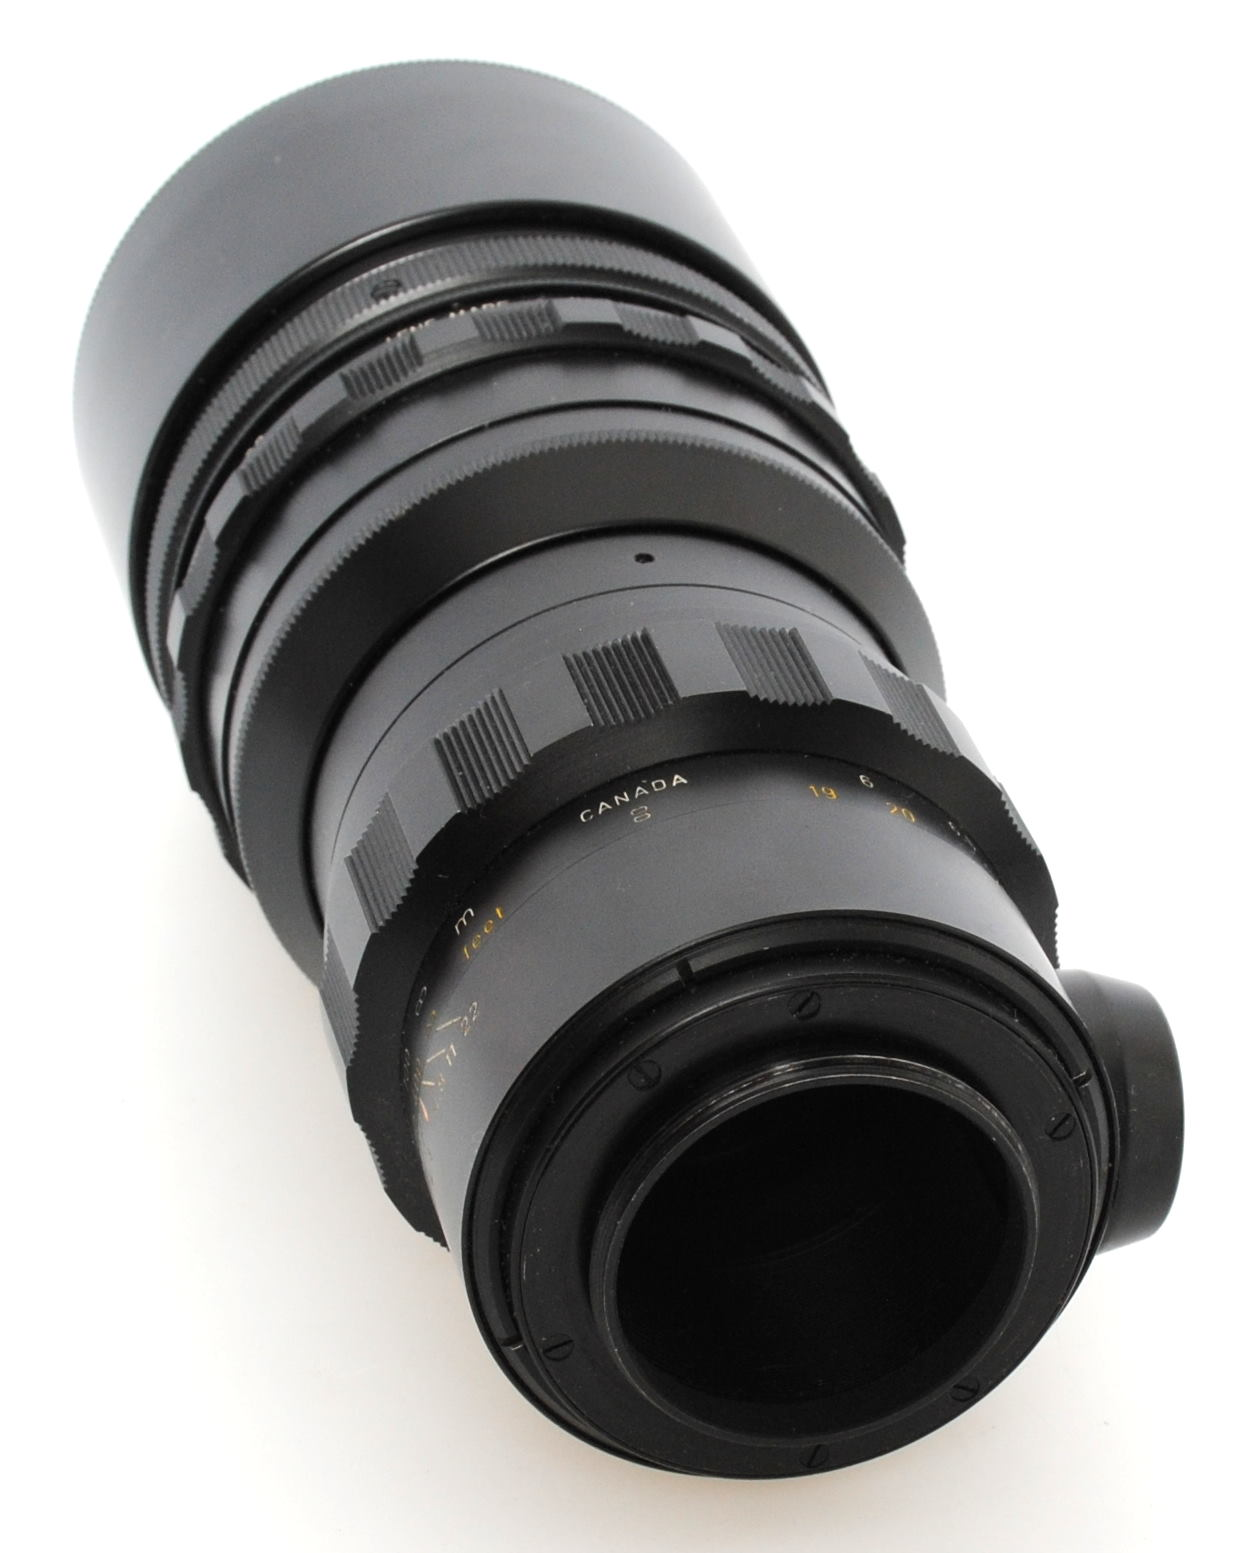 Leica-Leitz-Canada-Telyt-4-8-280-mm-black-lens